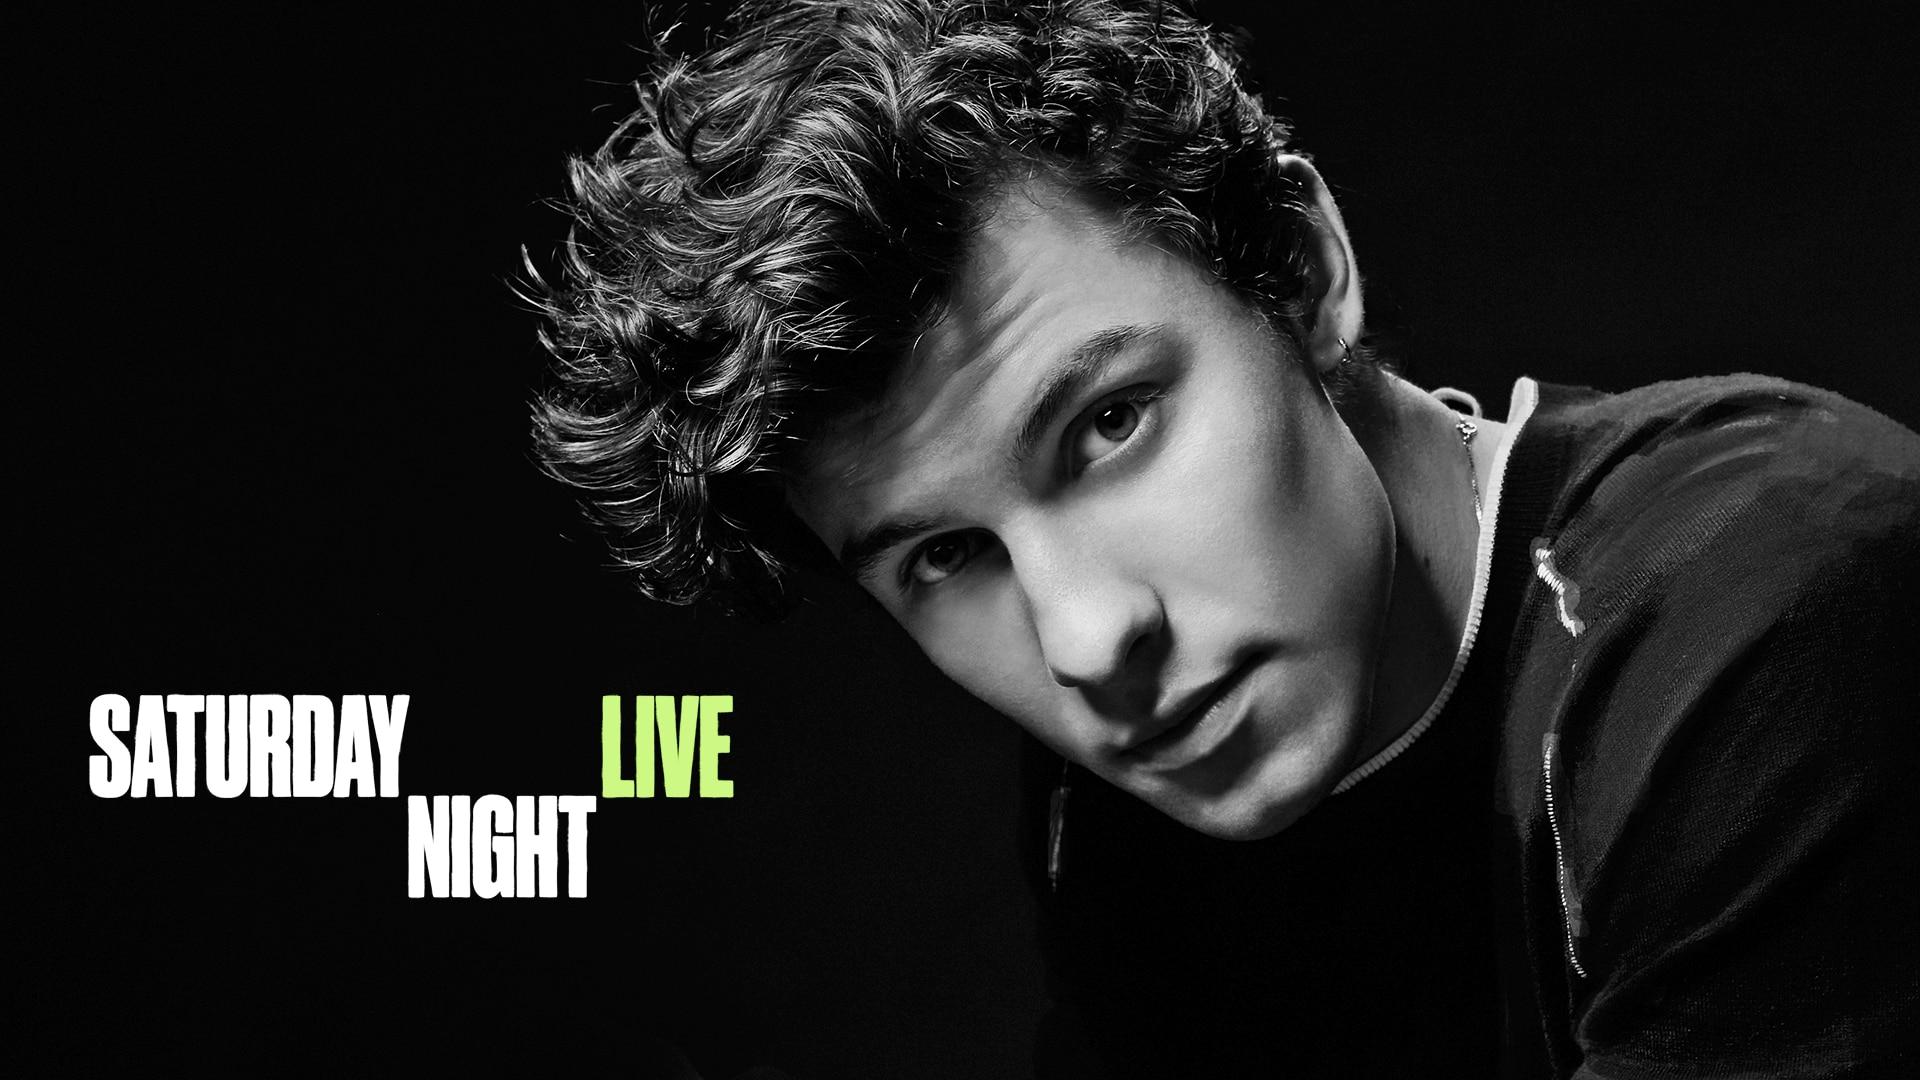 Saturday Night Live Adam Sandler And Shawn Mendes Bumper Photos